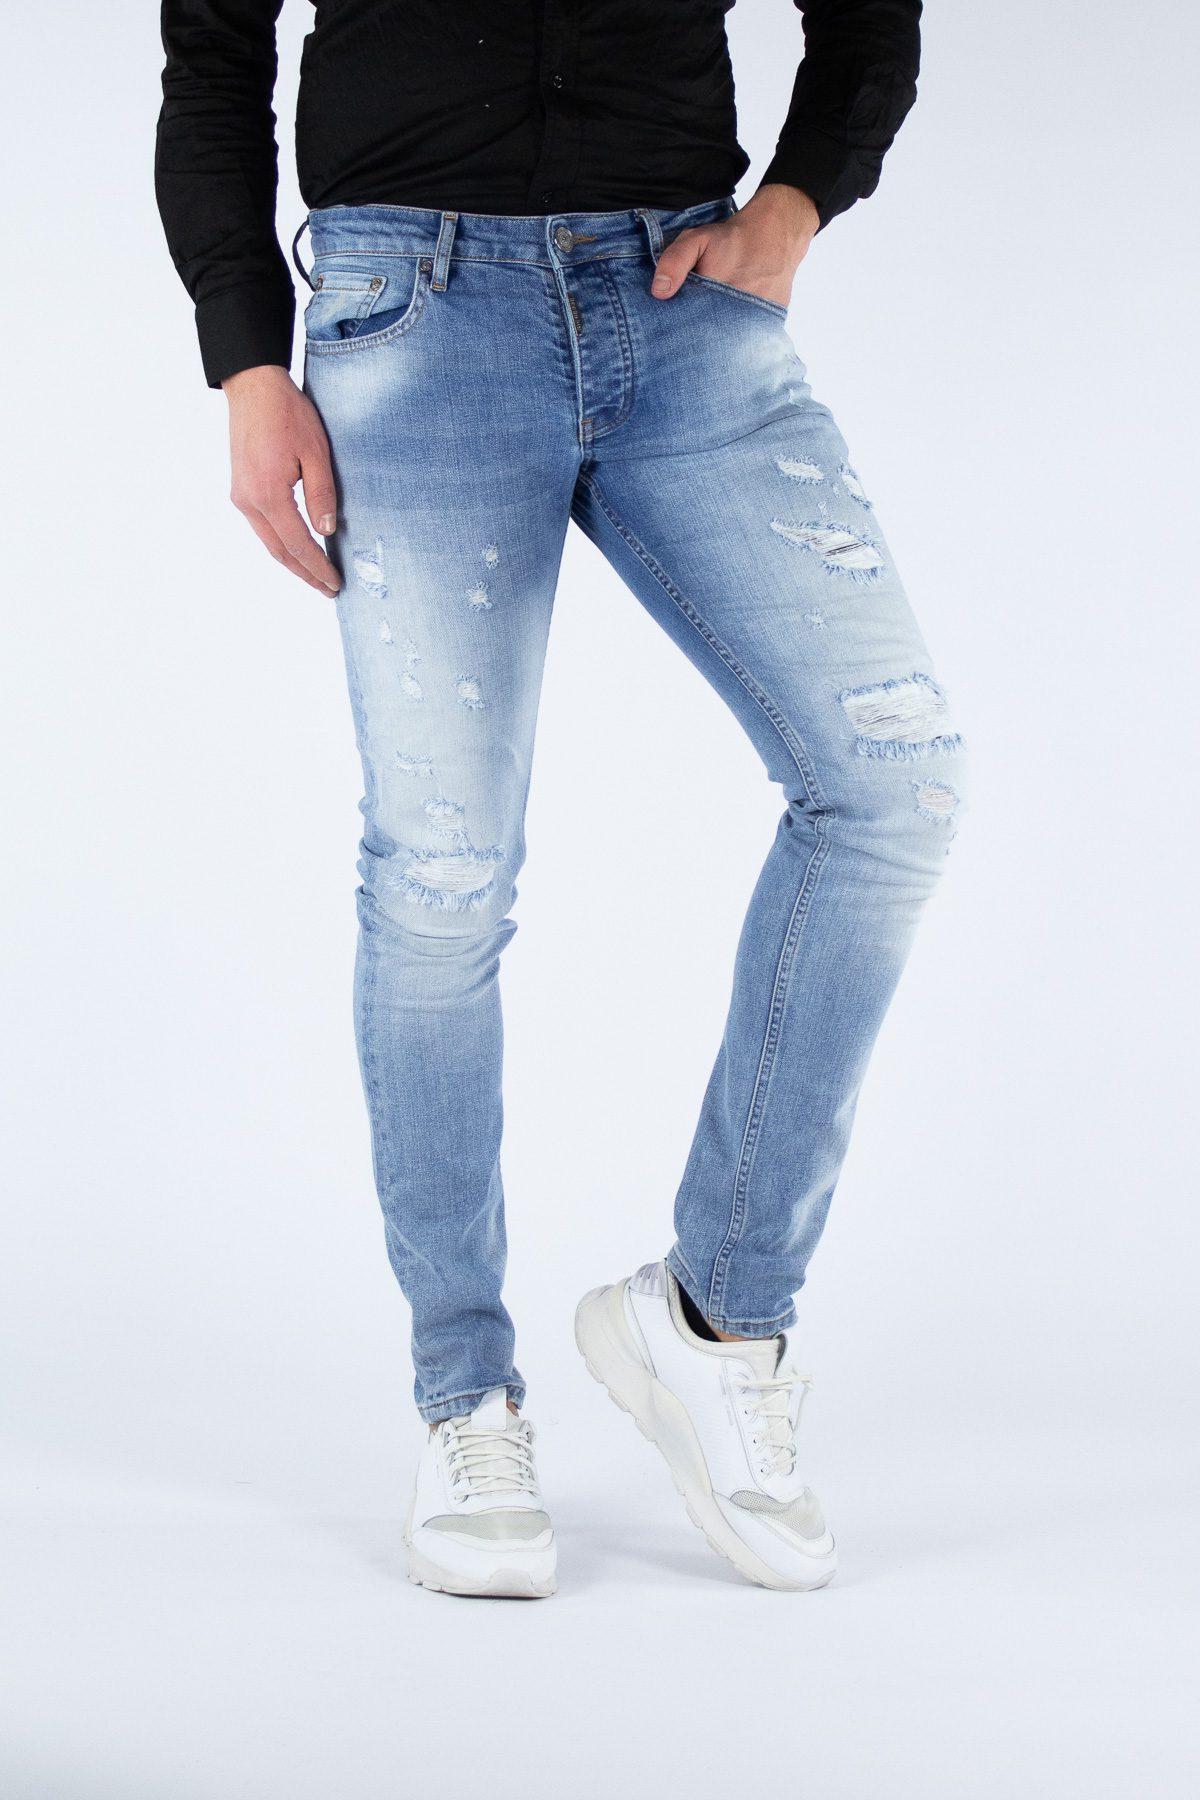 Clarity Light Blue Jeans – 2241-6-1